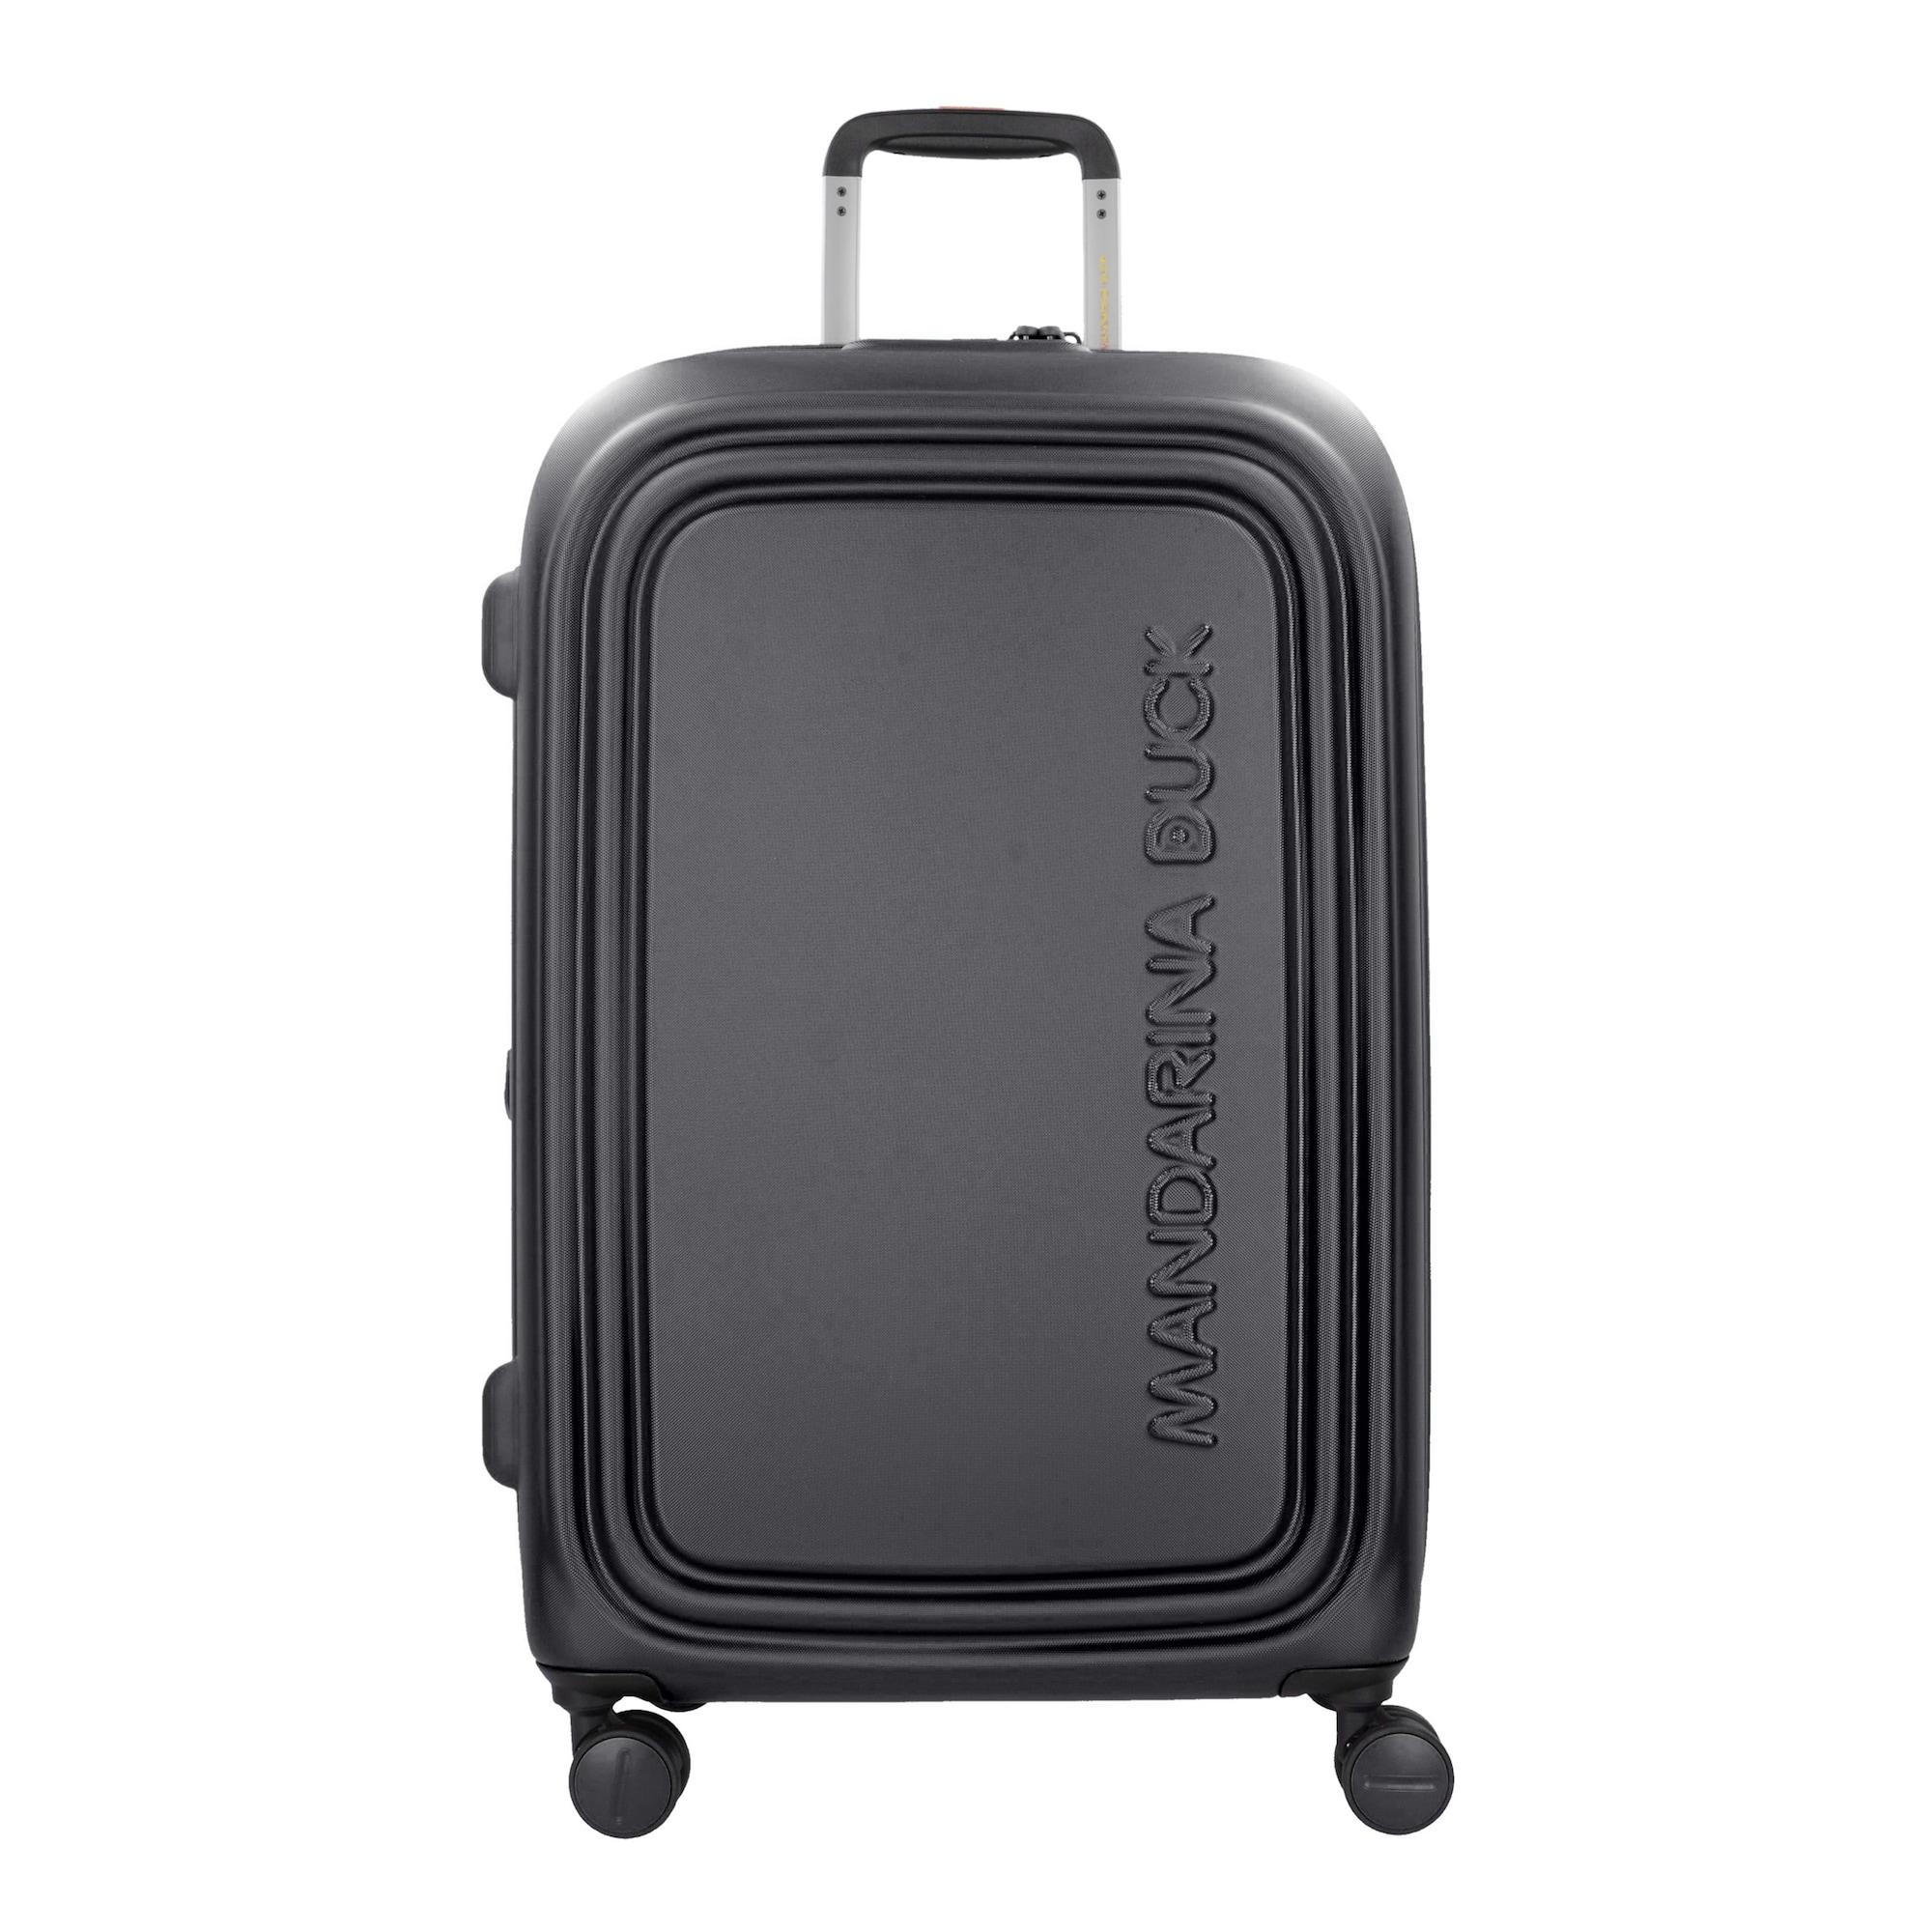 Trolley | Taschen > Koffer & Trolleys > Trolleys | Schwarz | Mandarina Duck